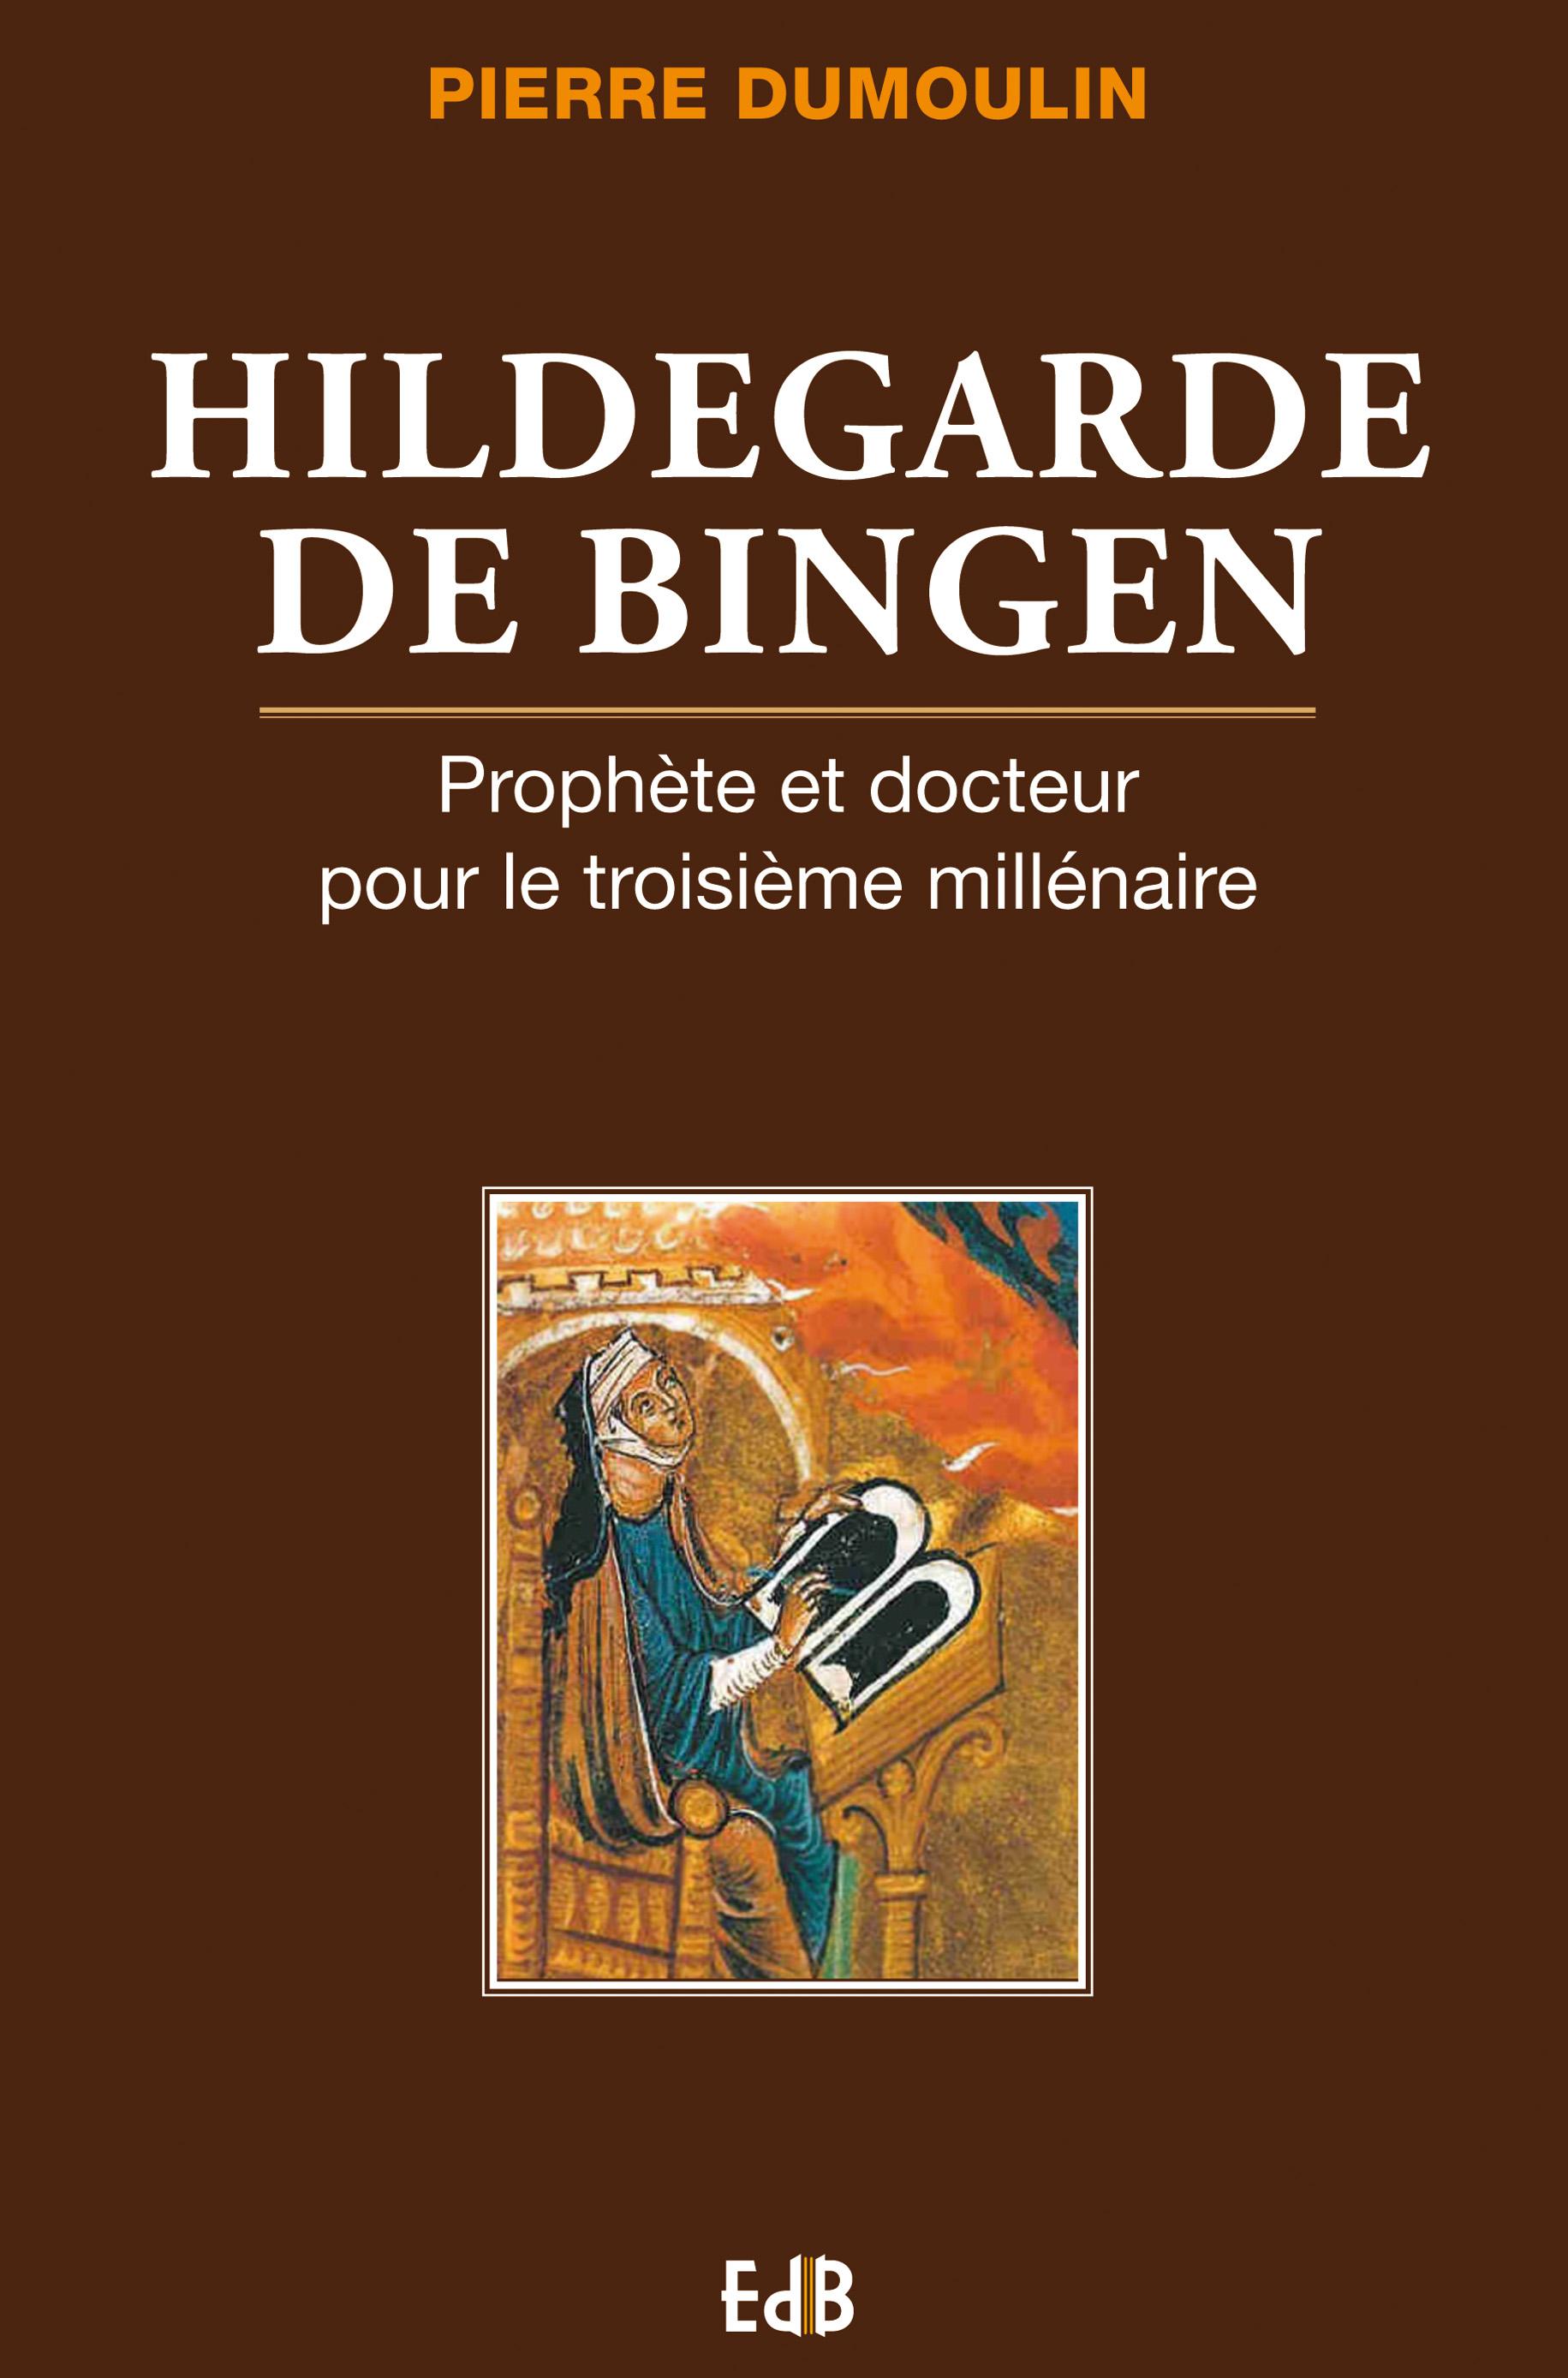 Sainte Hildegarde Et Les Pierres : sainte, hildegarde, pierres, Hildegarde, Bingen, Éditions, Béatitudes